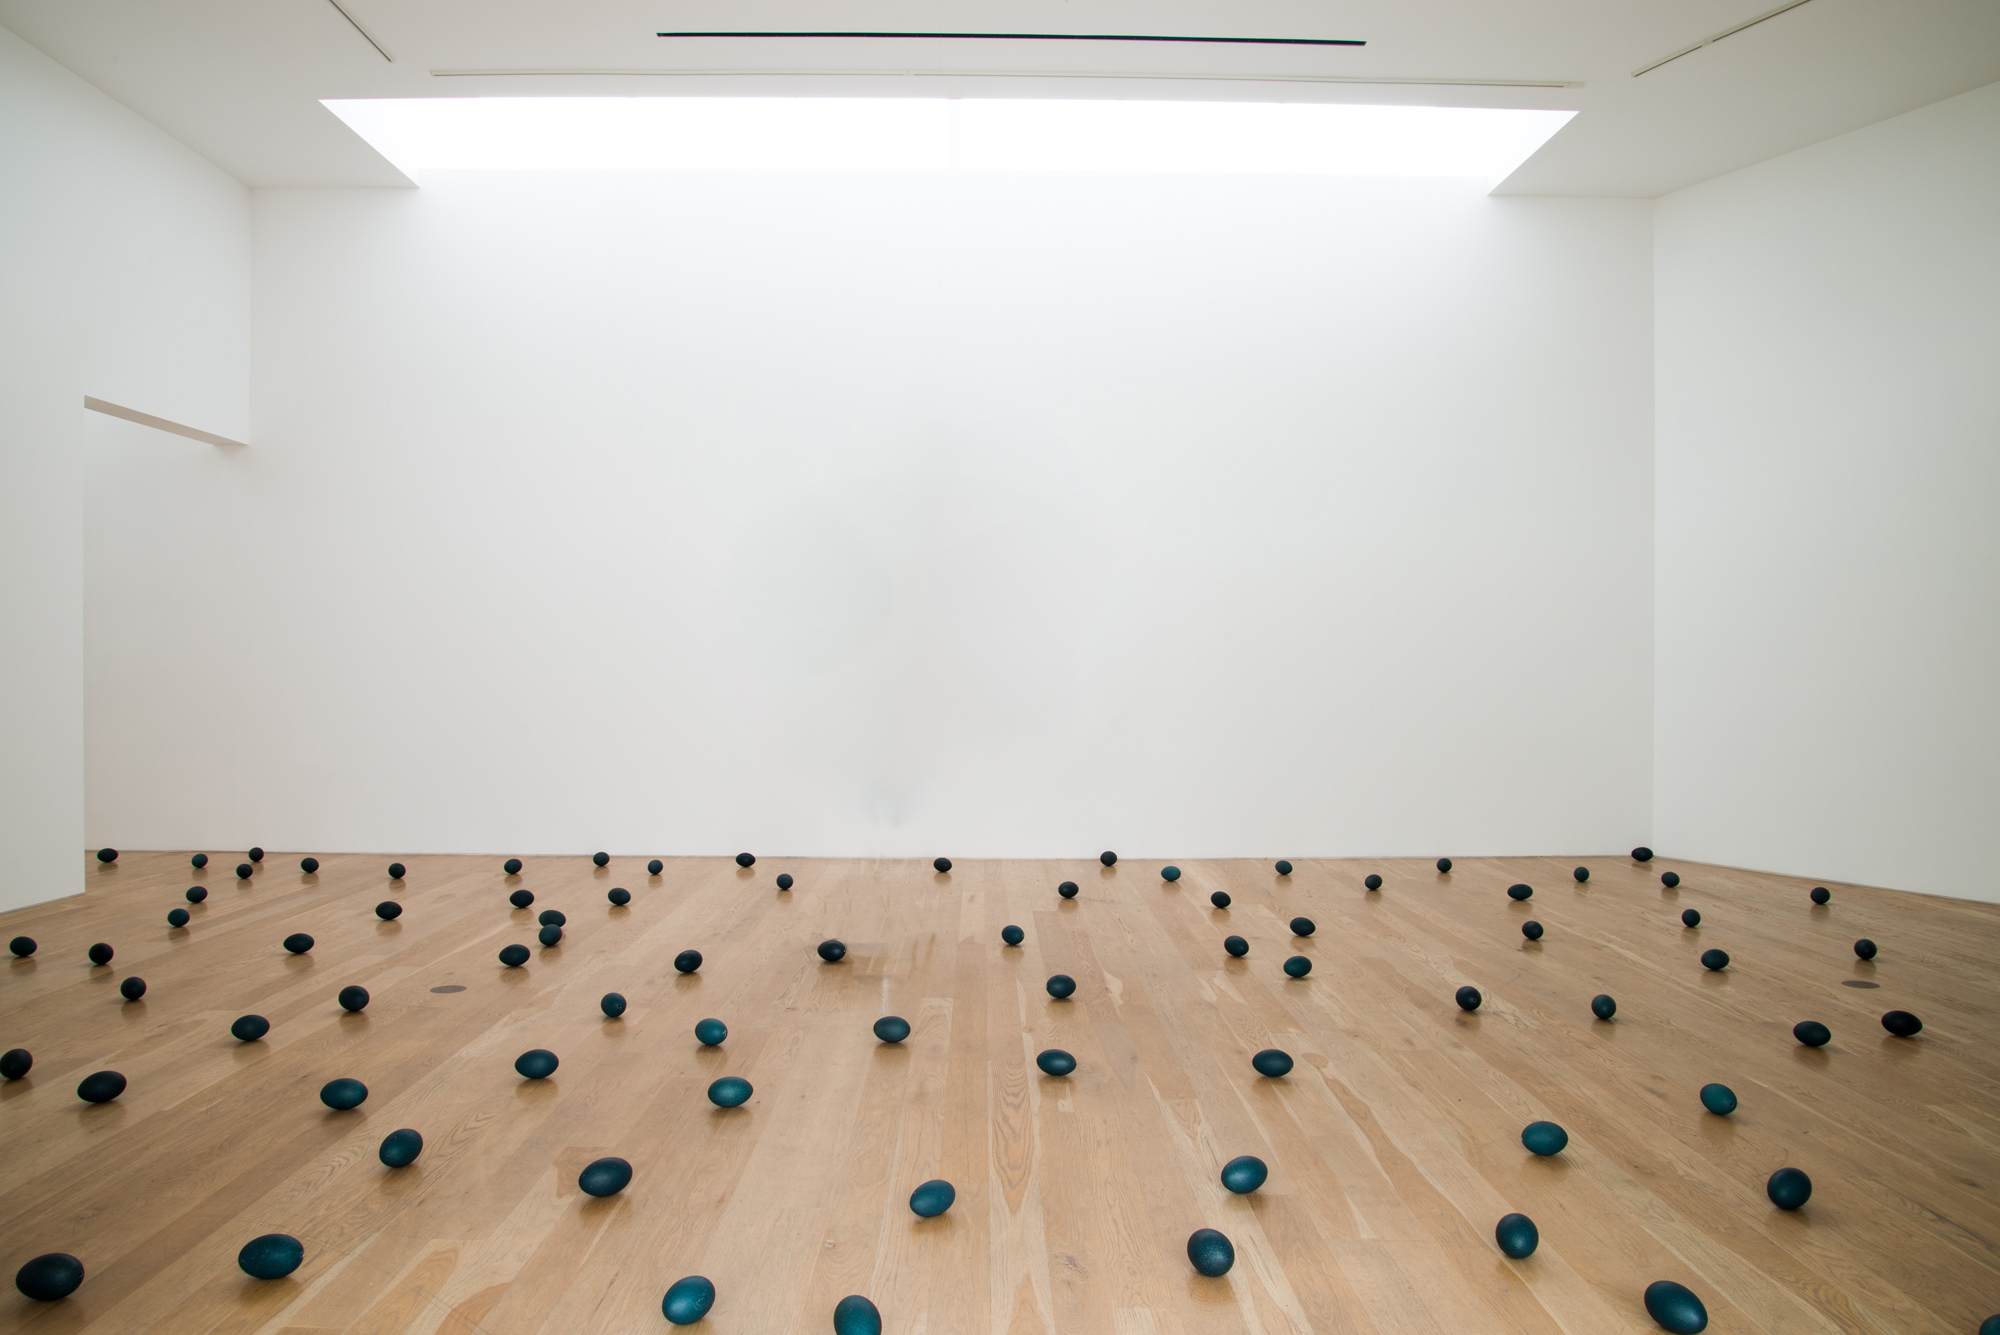 Installation View, 2014 Samuel Freeman Gallery, Los Angles, CA